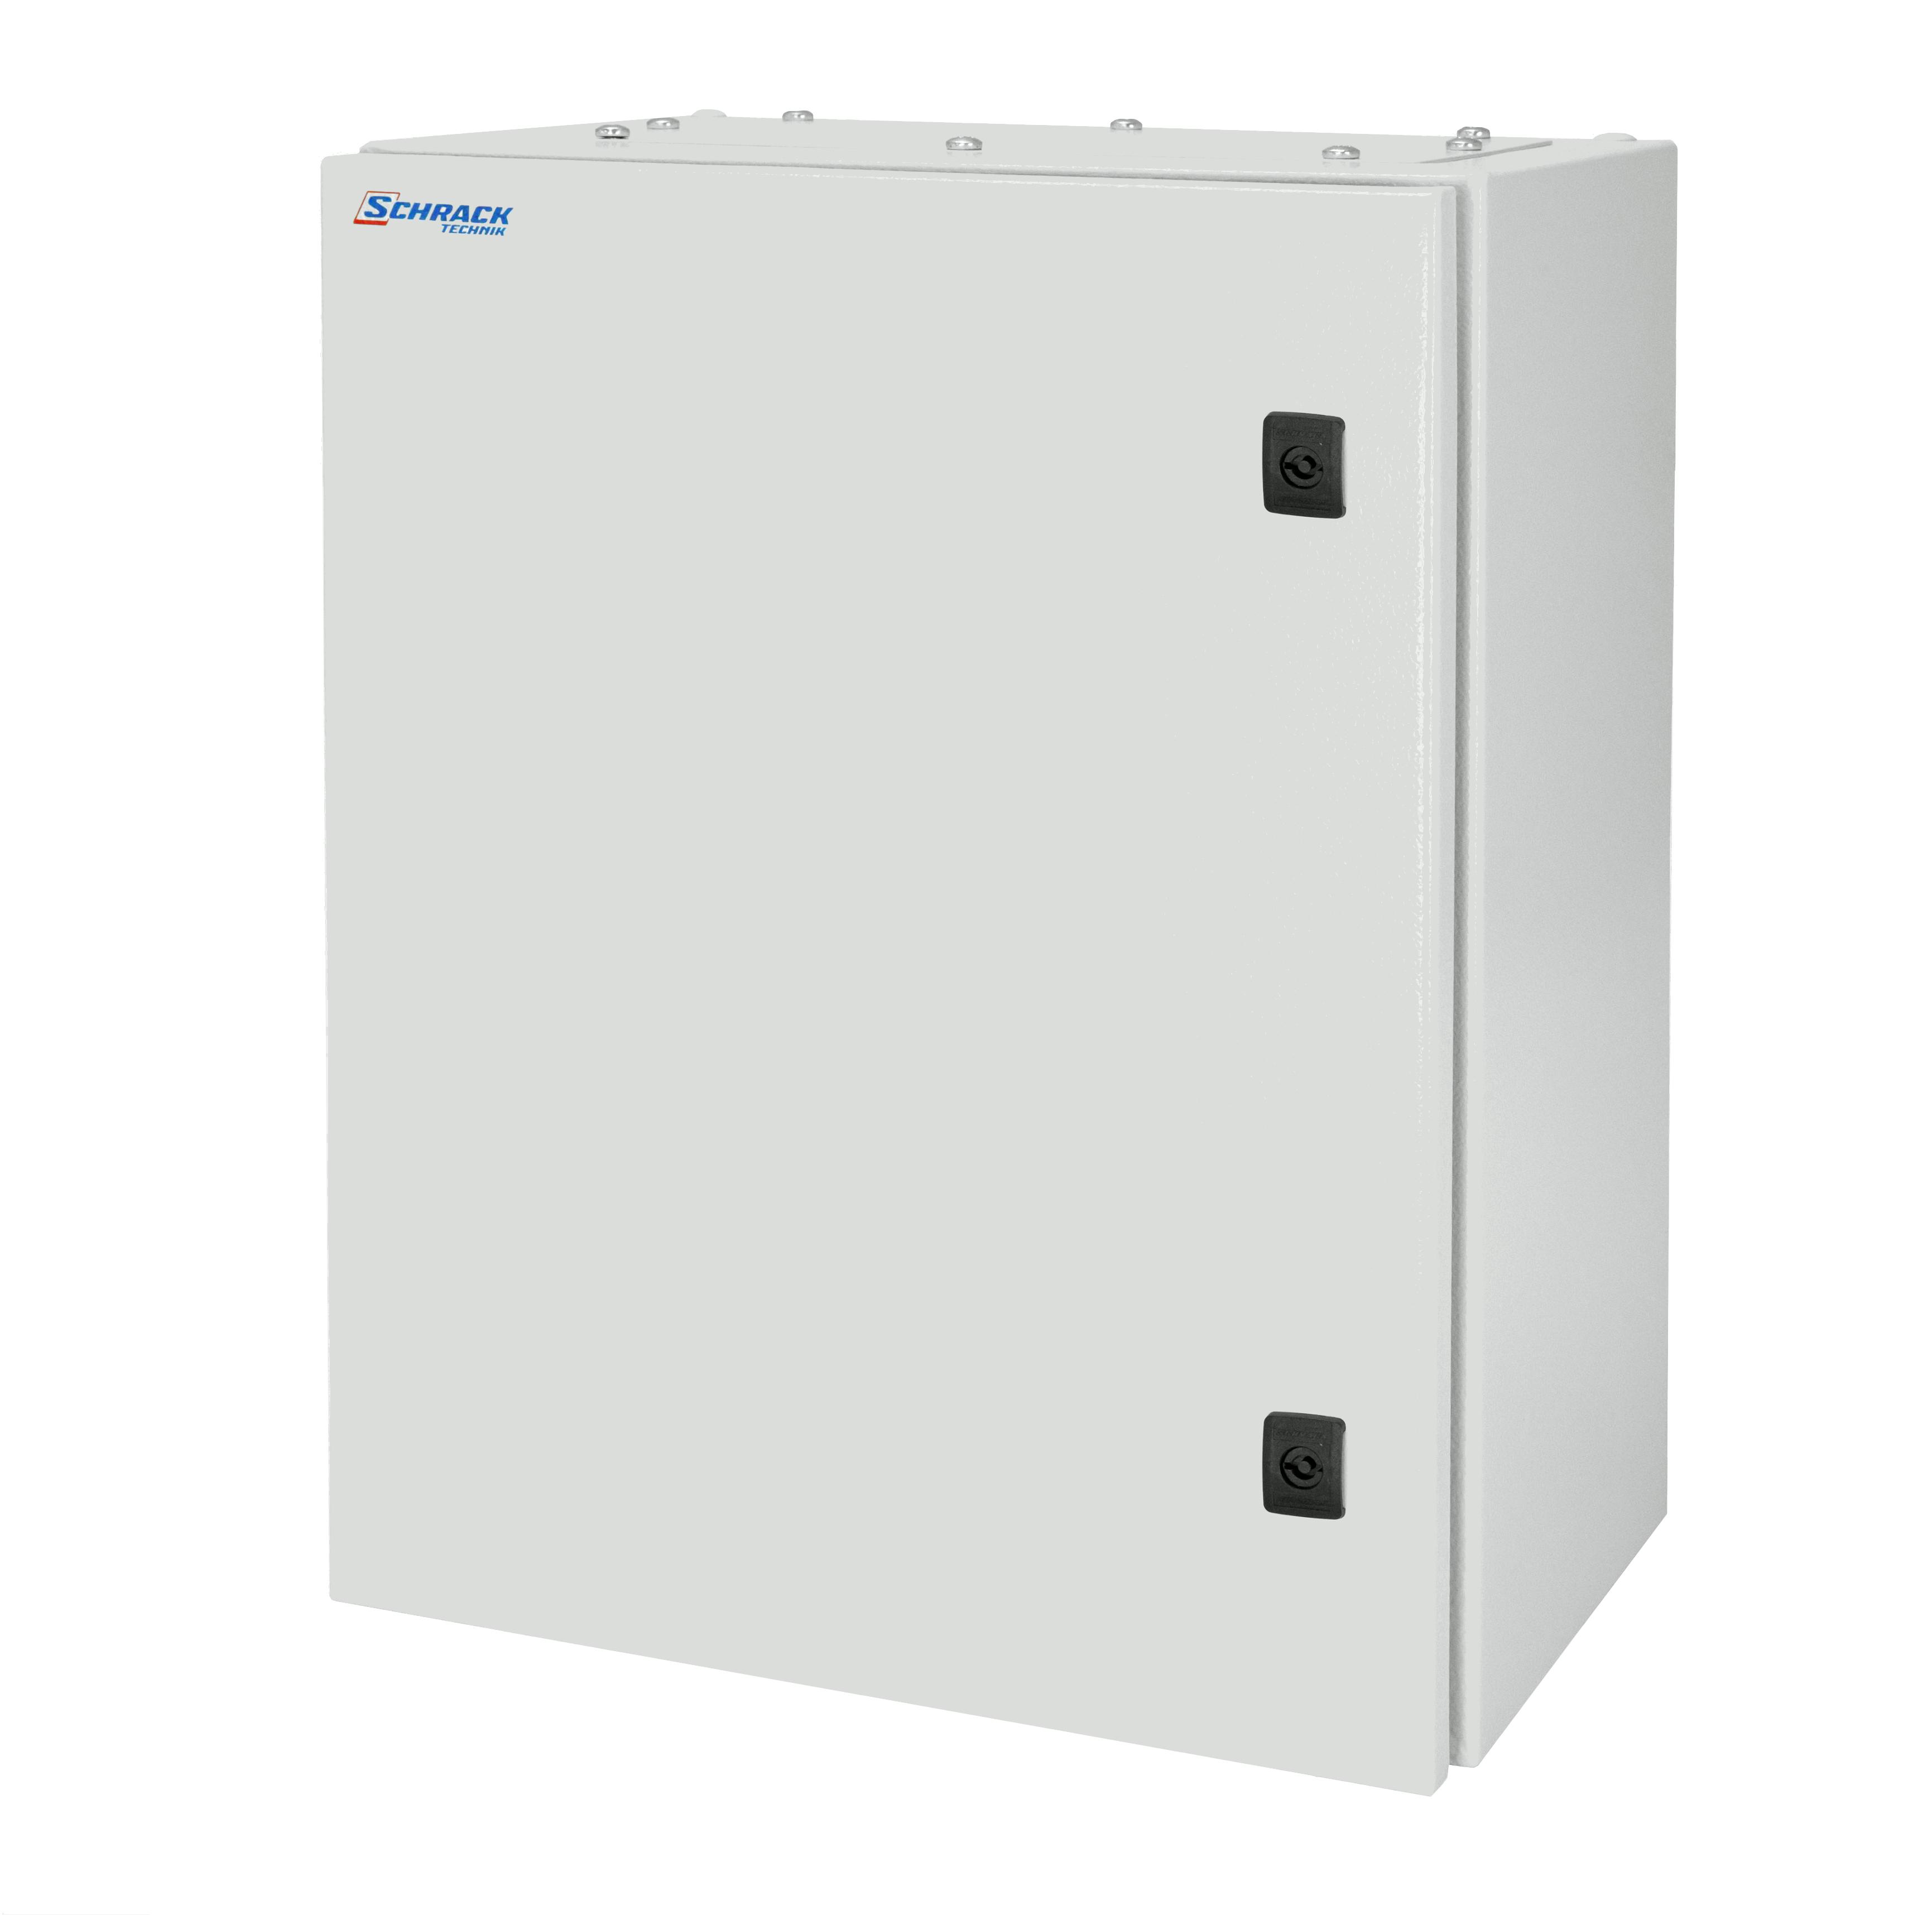 1 Stk Wandschrank Mono IP66 H=800 B=800 T=300 Stahlblech WSM8080300